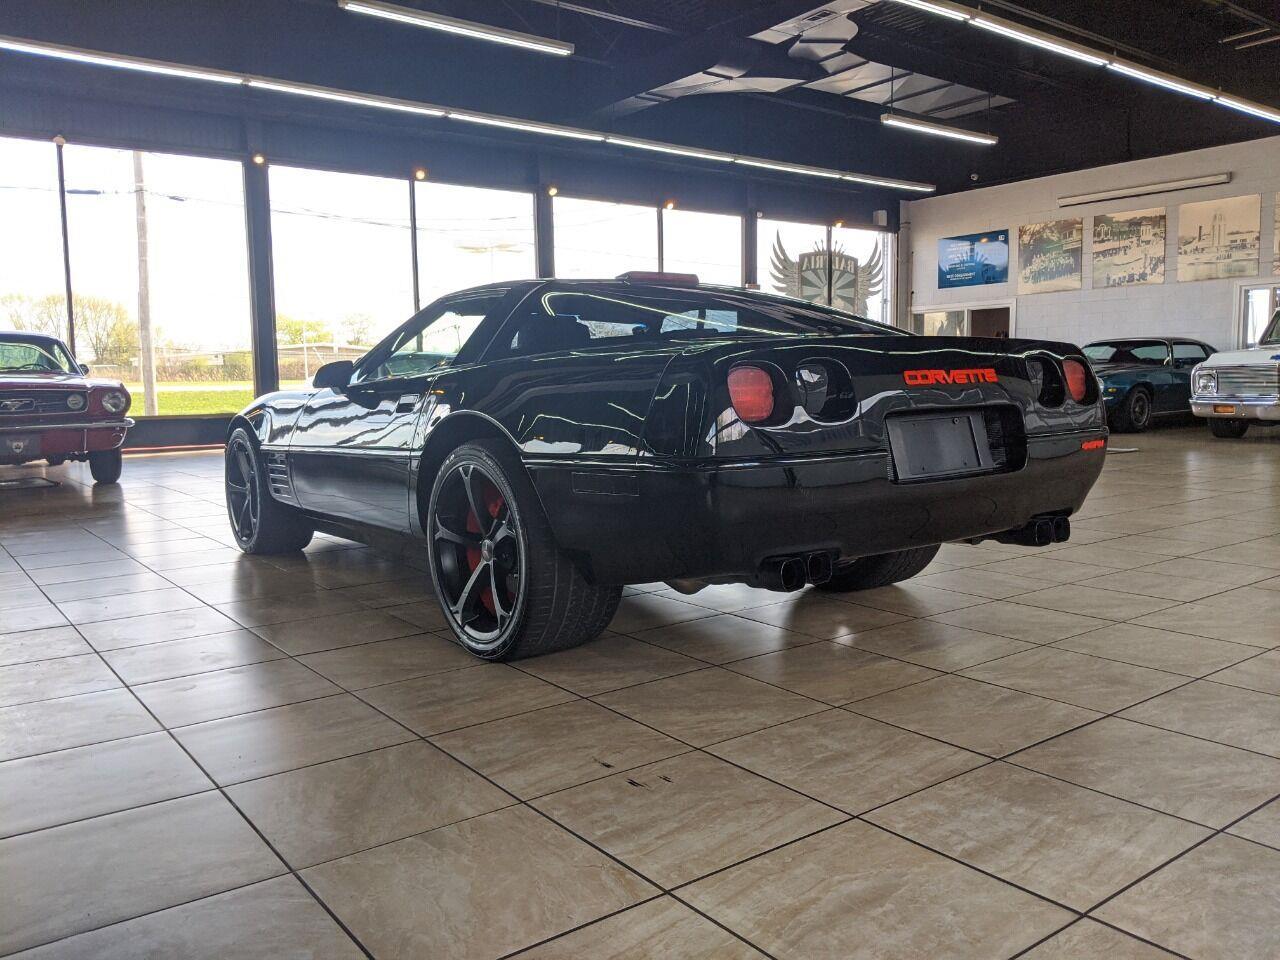 1991 Chevrolet Corvette (CC-1346069) for sale in St. Charles, Illinois